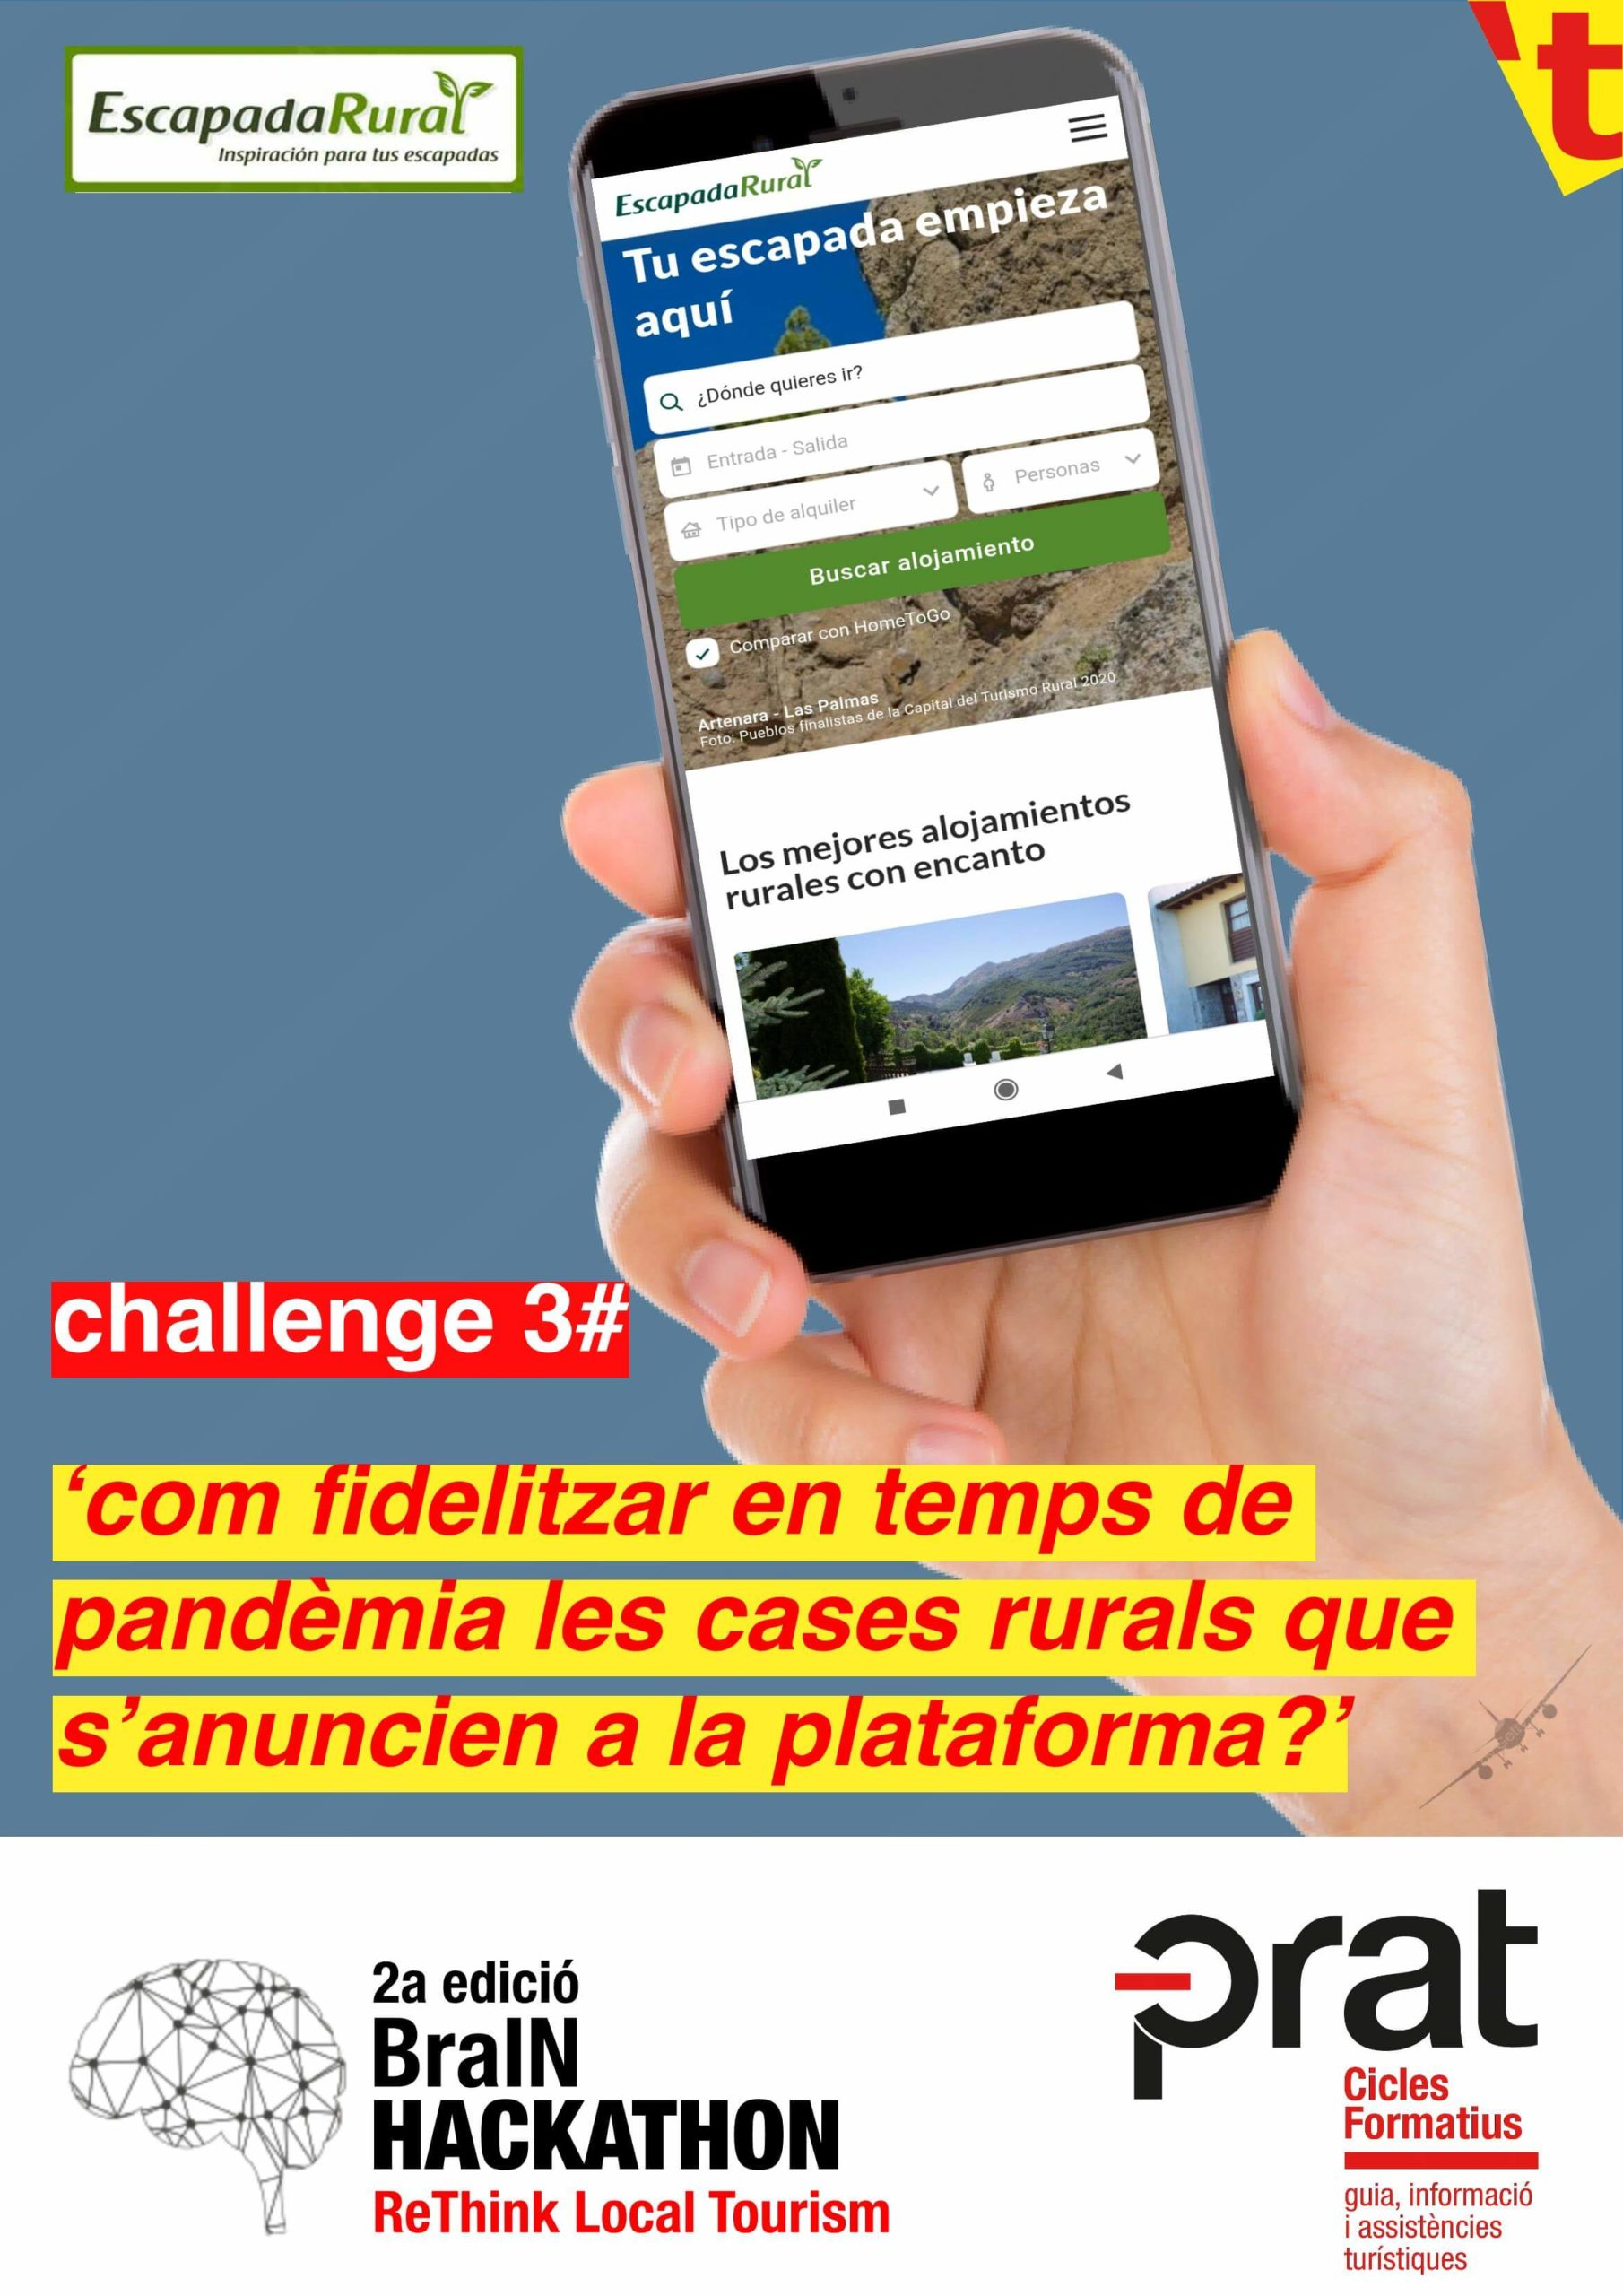 Hackathon de Turisme: repte 3 - Cicle Formatiu de Grau Superior de Turisme a Prat Educació